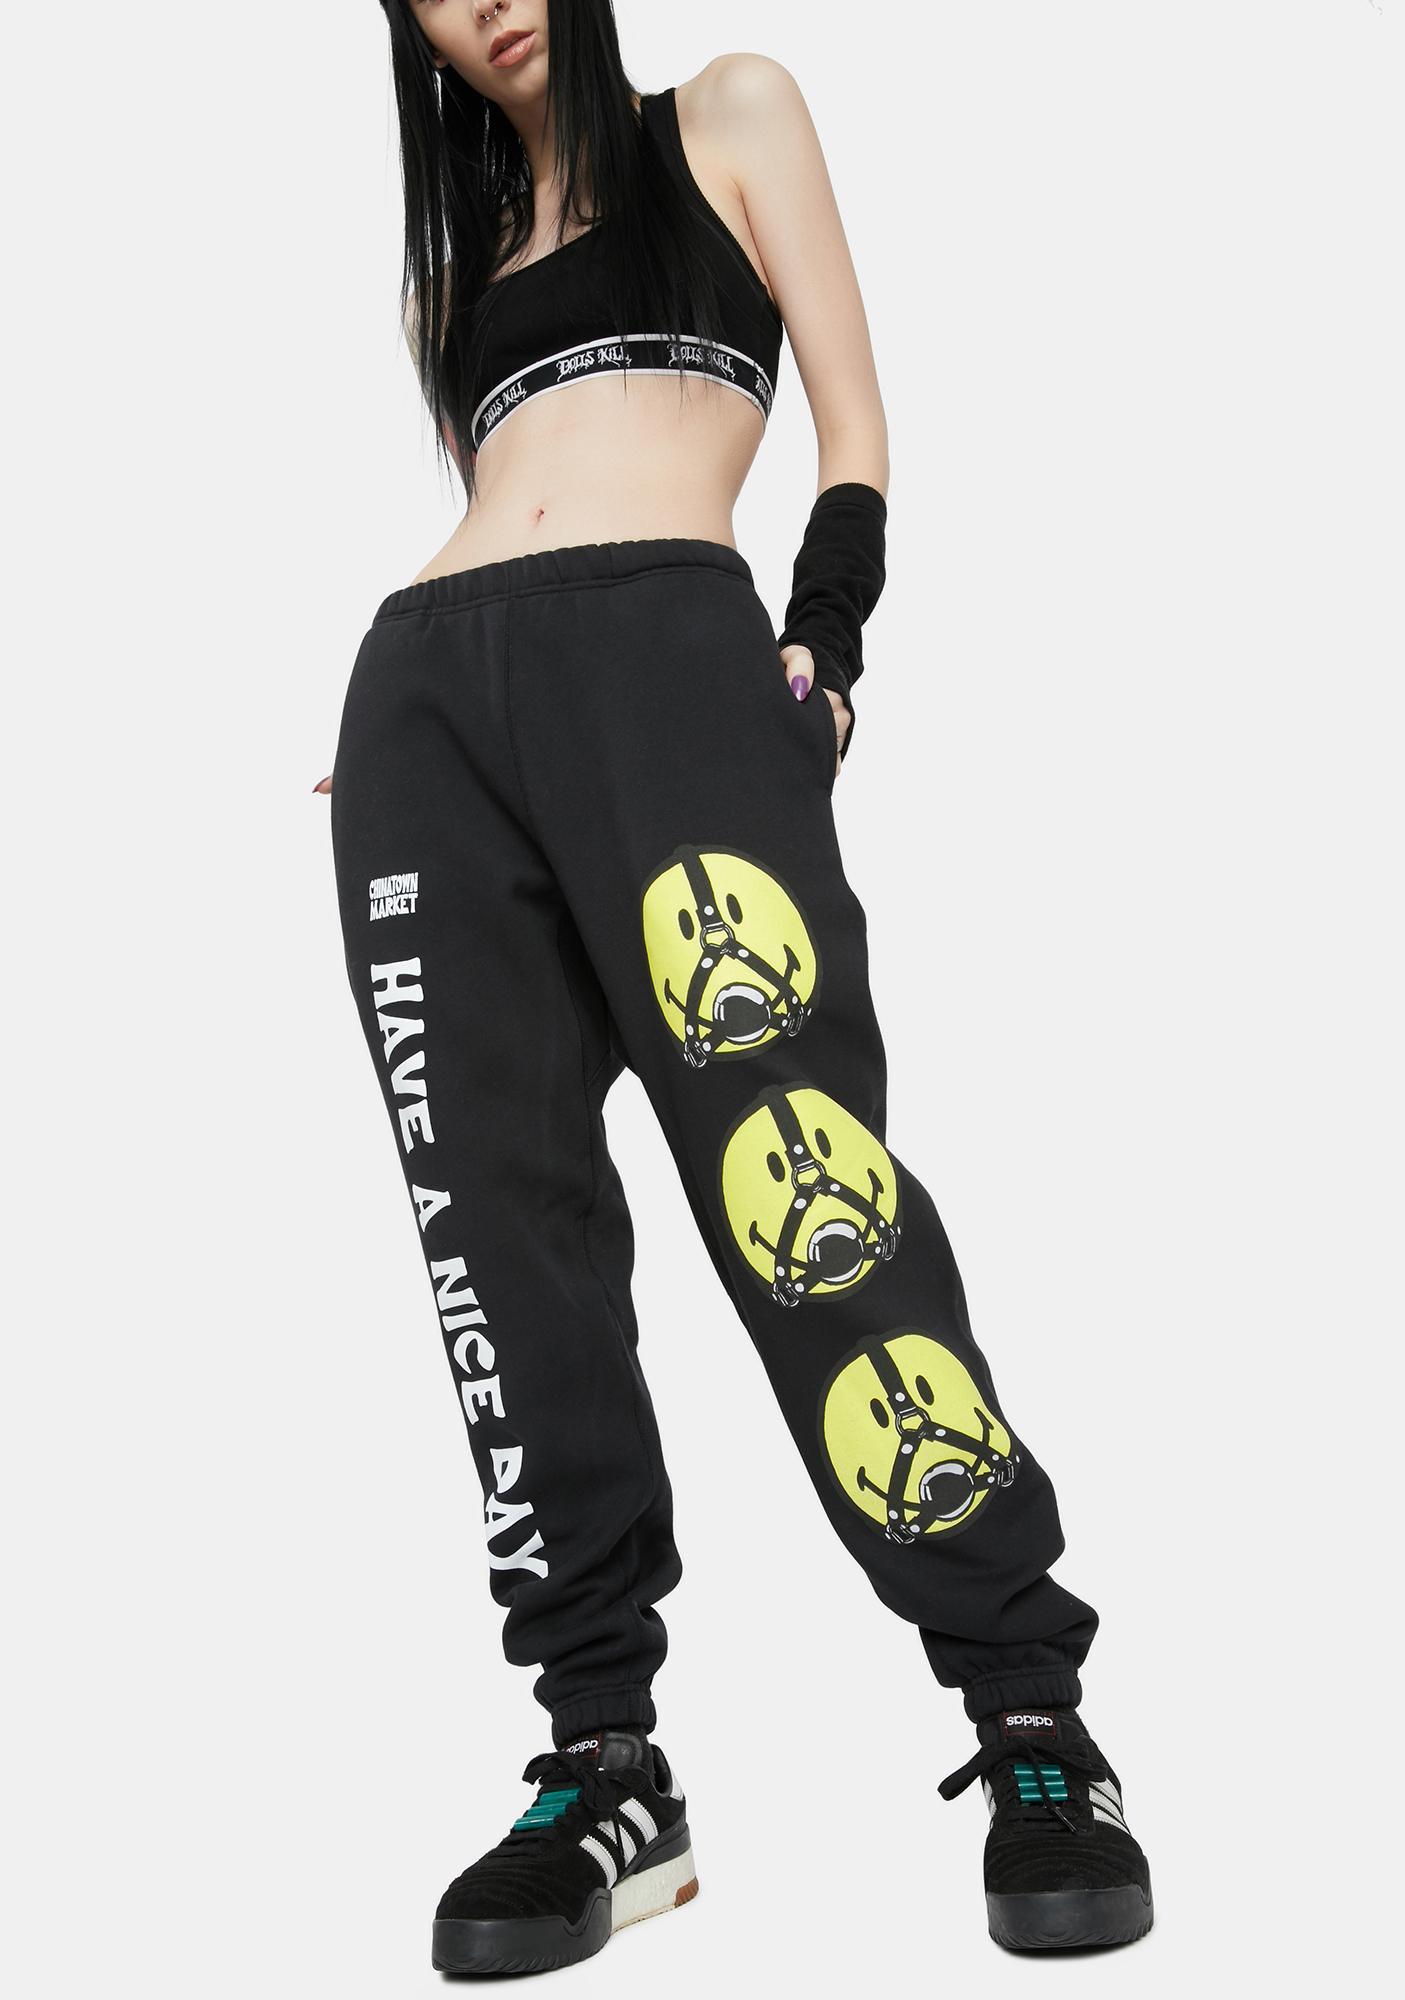 CHINATOWN MARKET Smiley Ball Gag Sweatpants